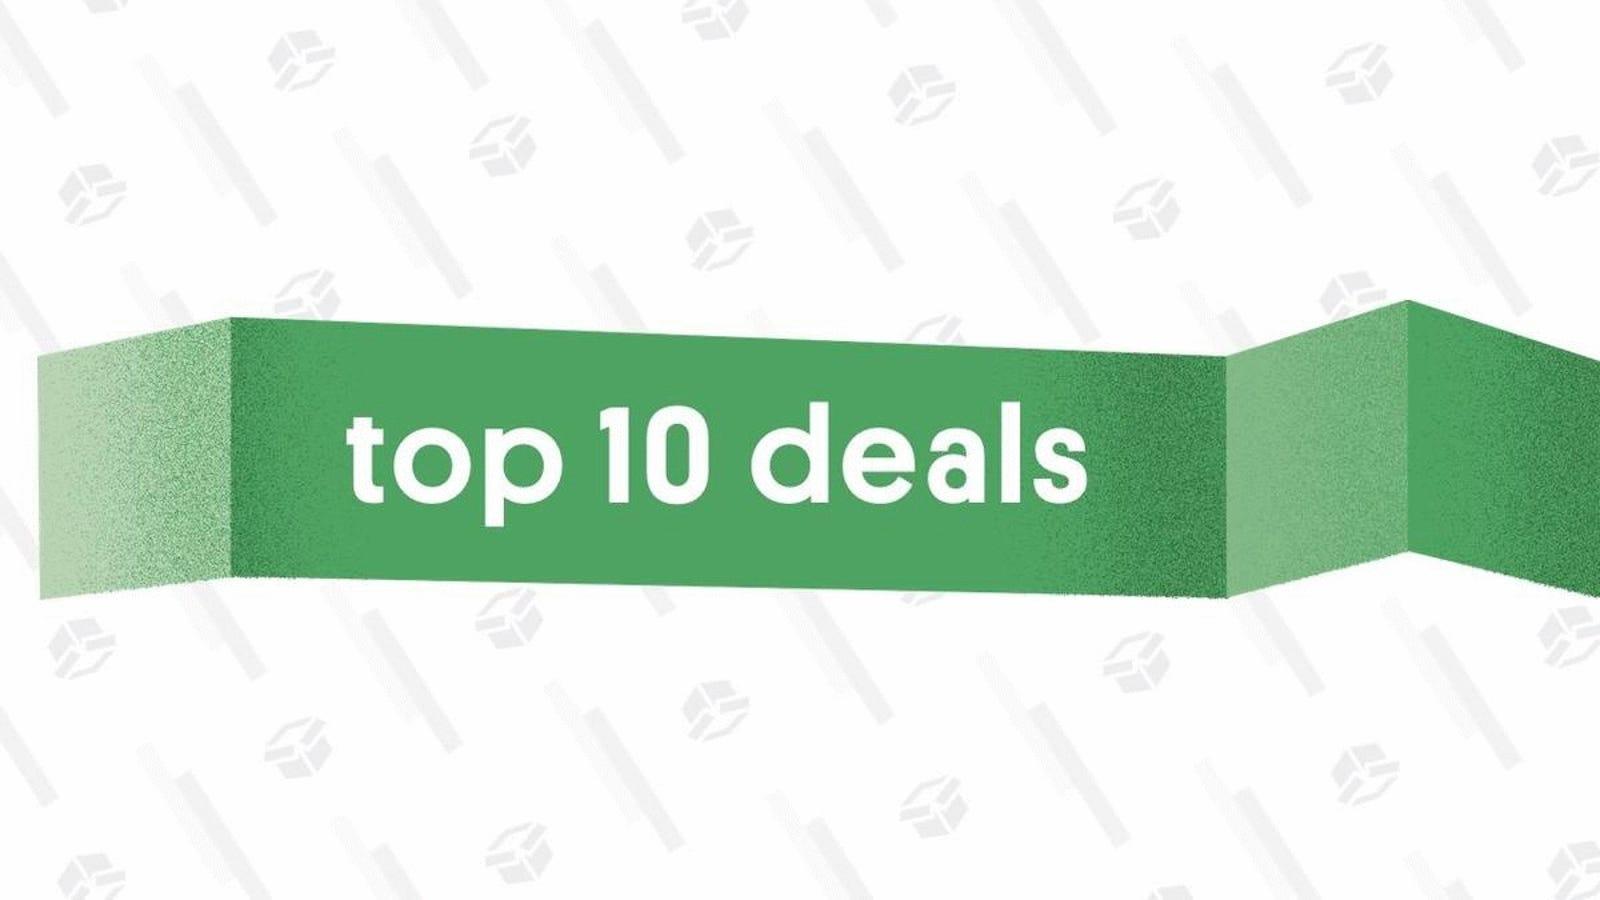 The 10 Best Deals of September 19, 2019